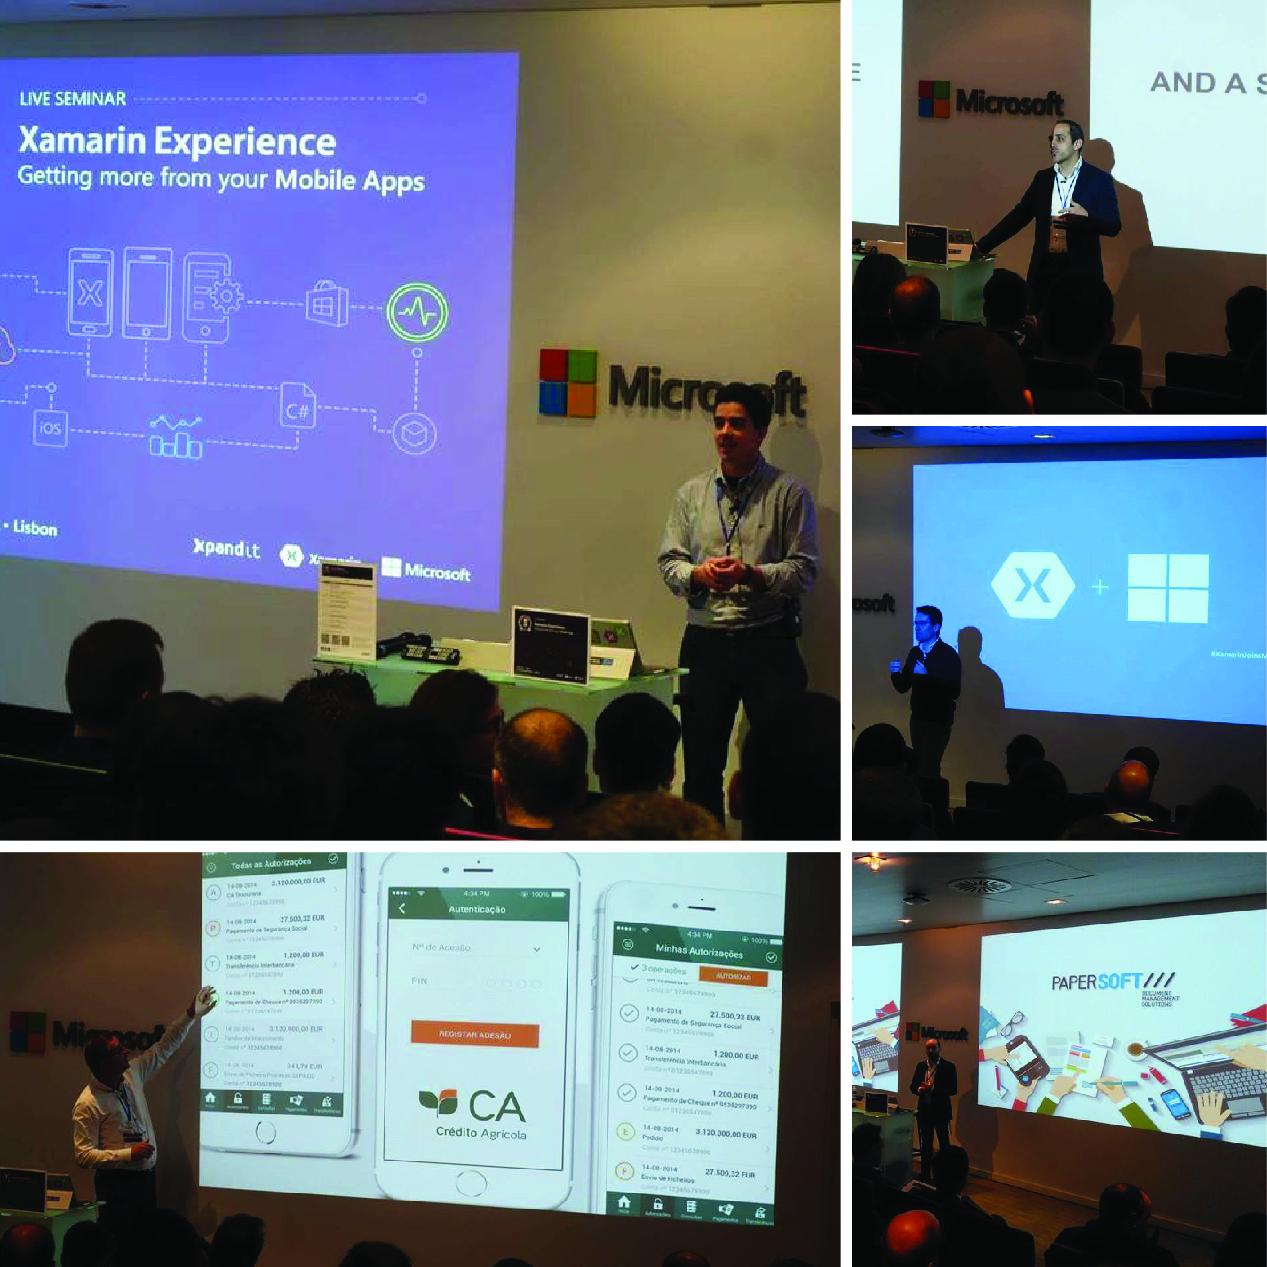 Xamarin Experience 2016 in Lisbon